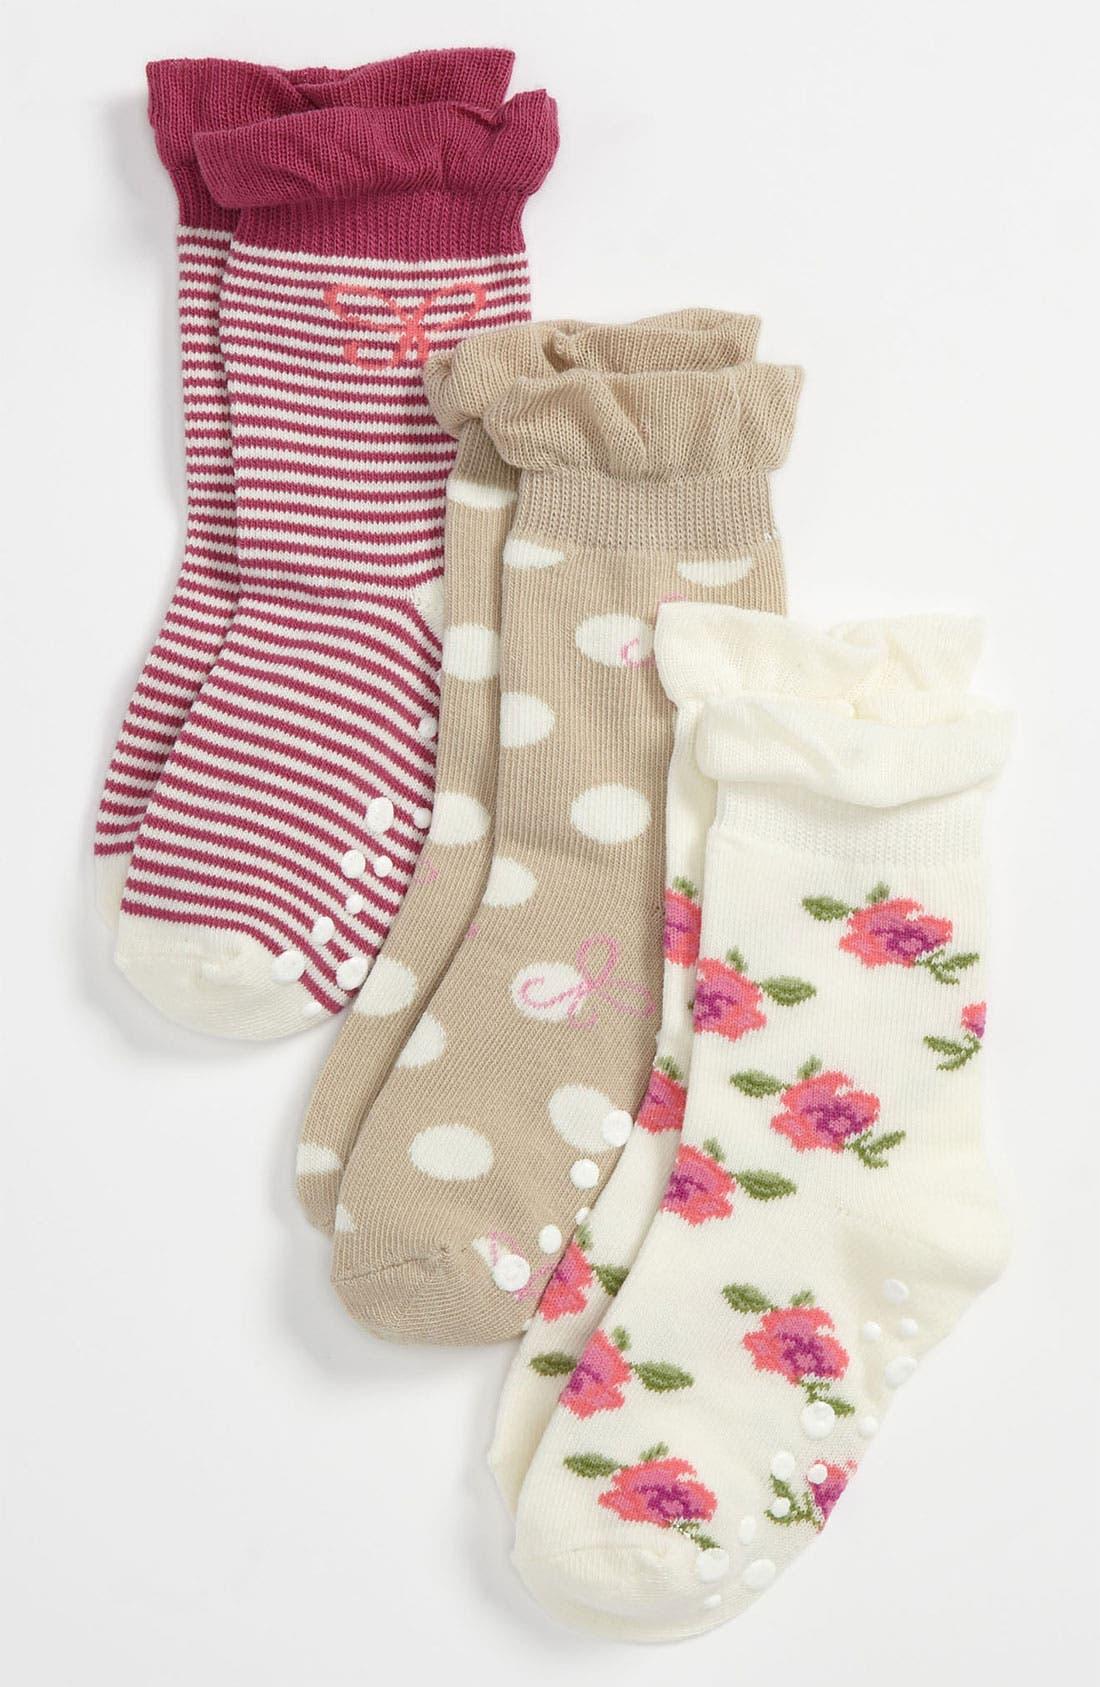 Alternate Image 1 Selected - Nordstrom 'Posey Toes' Socks (3-Pack) (Girls)